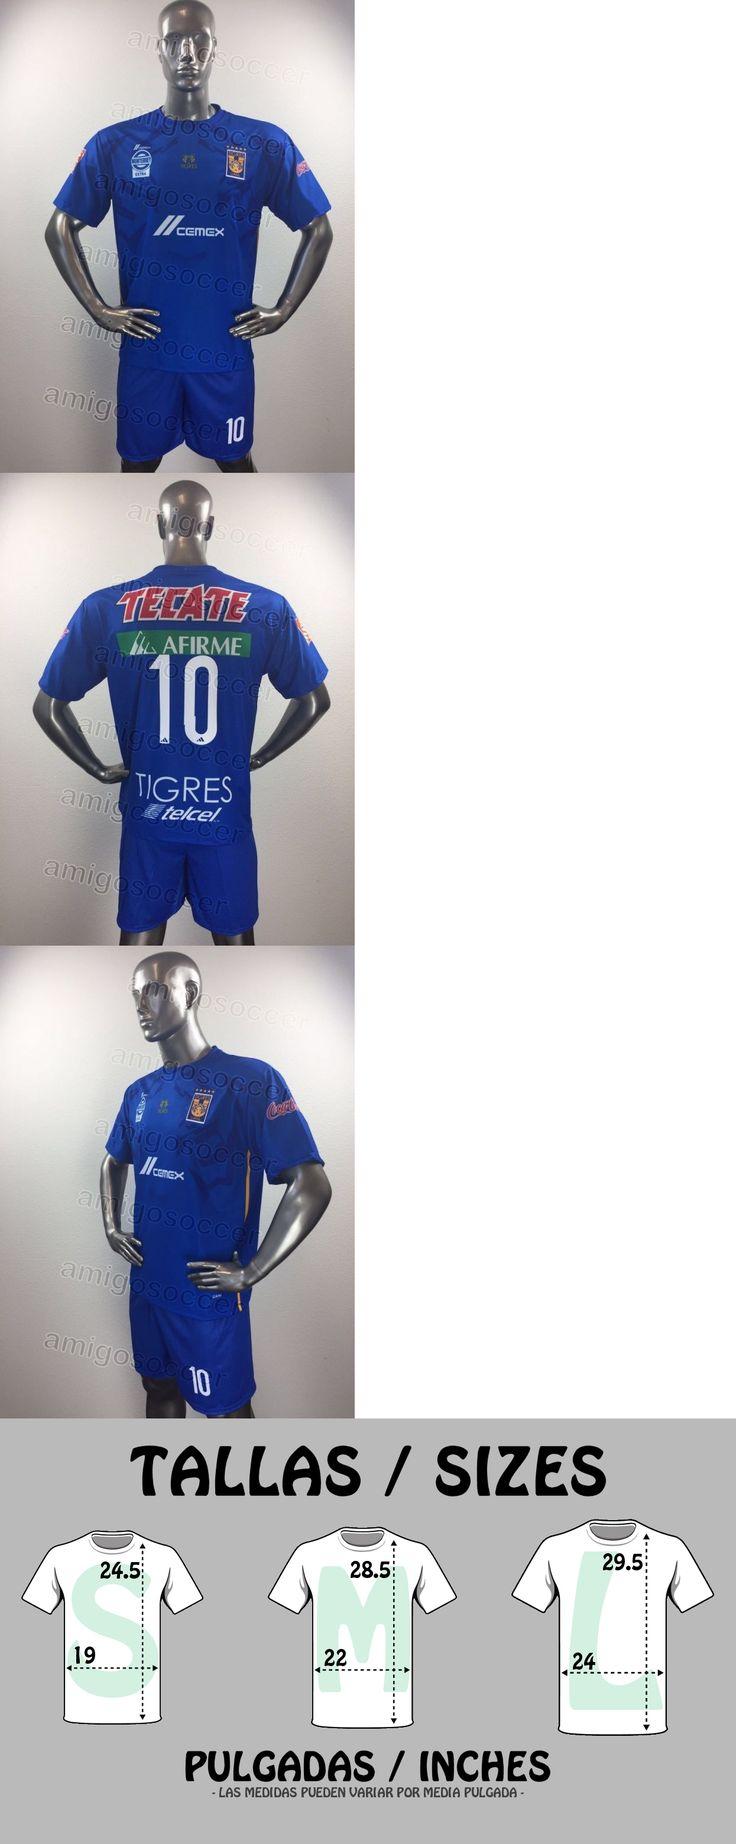 Men 123490: 15 Tigres Away (S M L) Soccer Uniforms - Uniformes De Futbol -> BUY IT NOW ONLY: $300 on eBay!